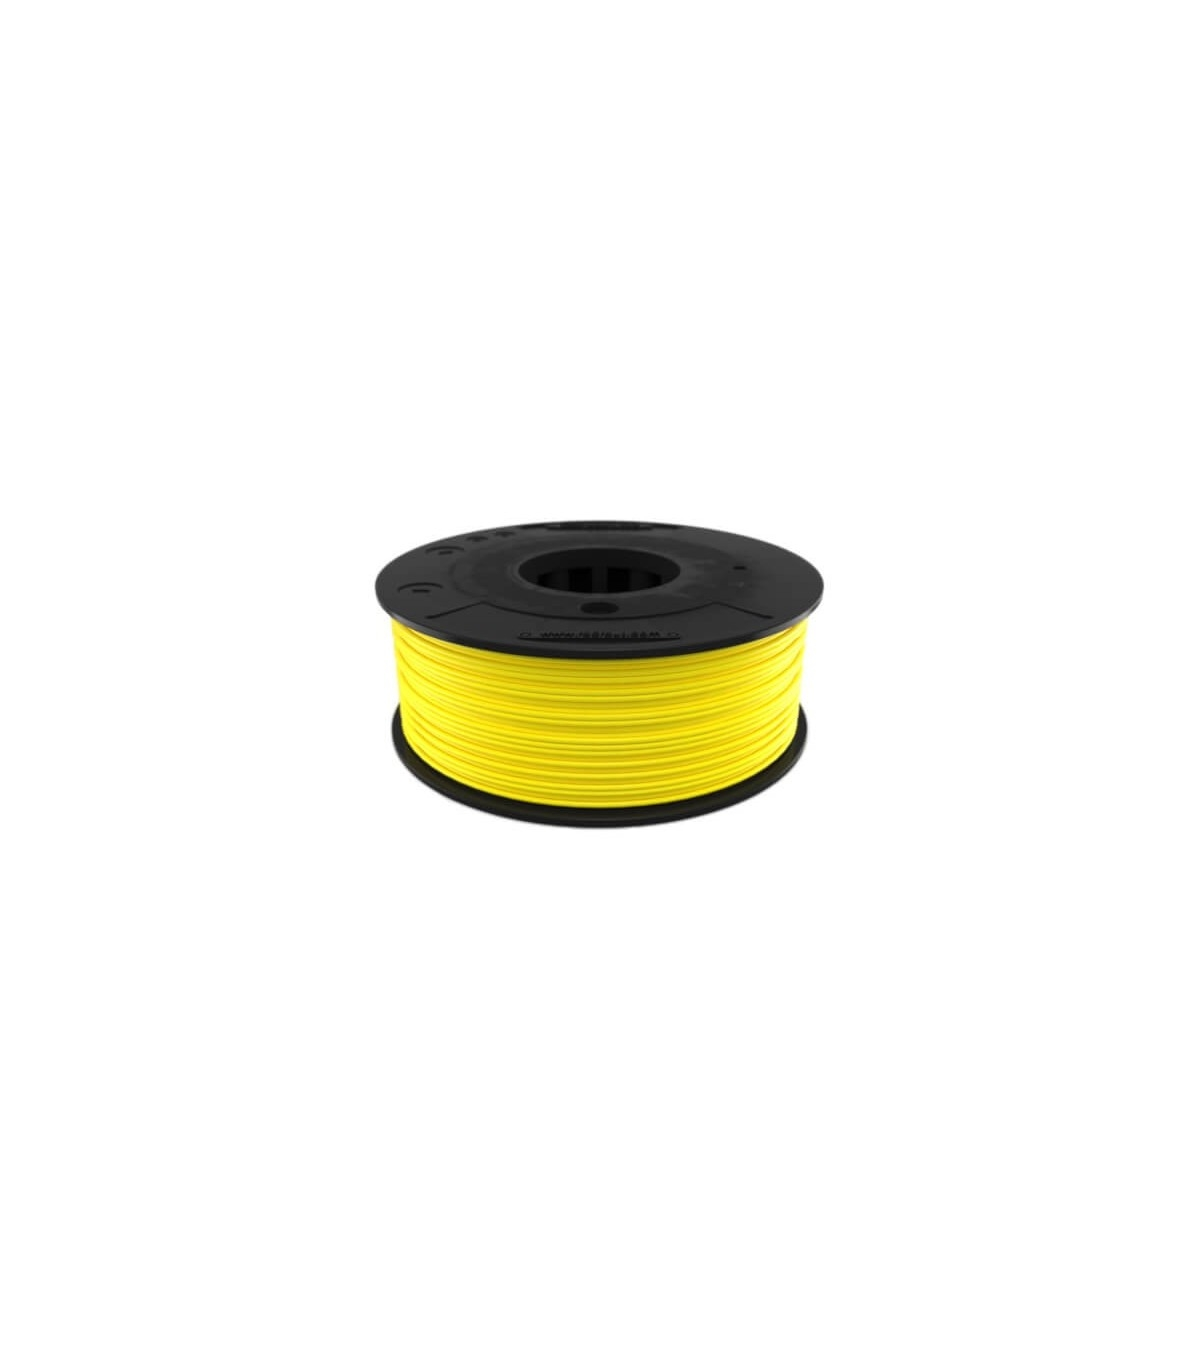 FilaFlex Yellow 82A TPE Filament 1.75 mm 250g